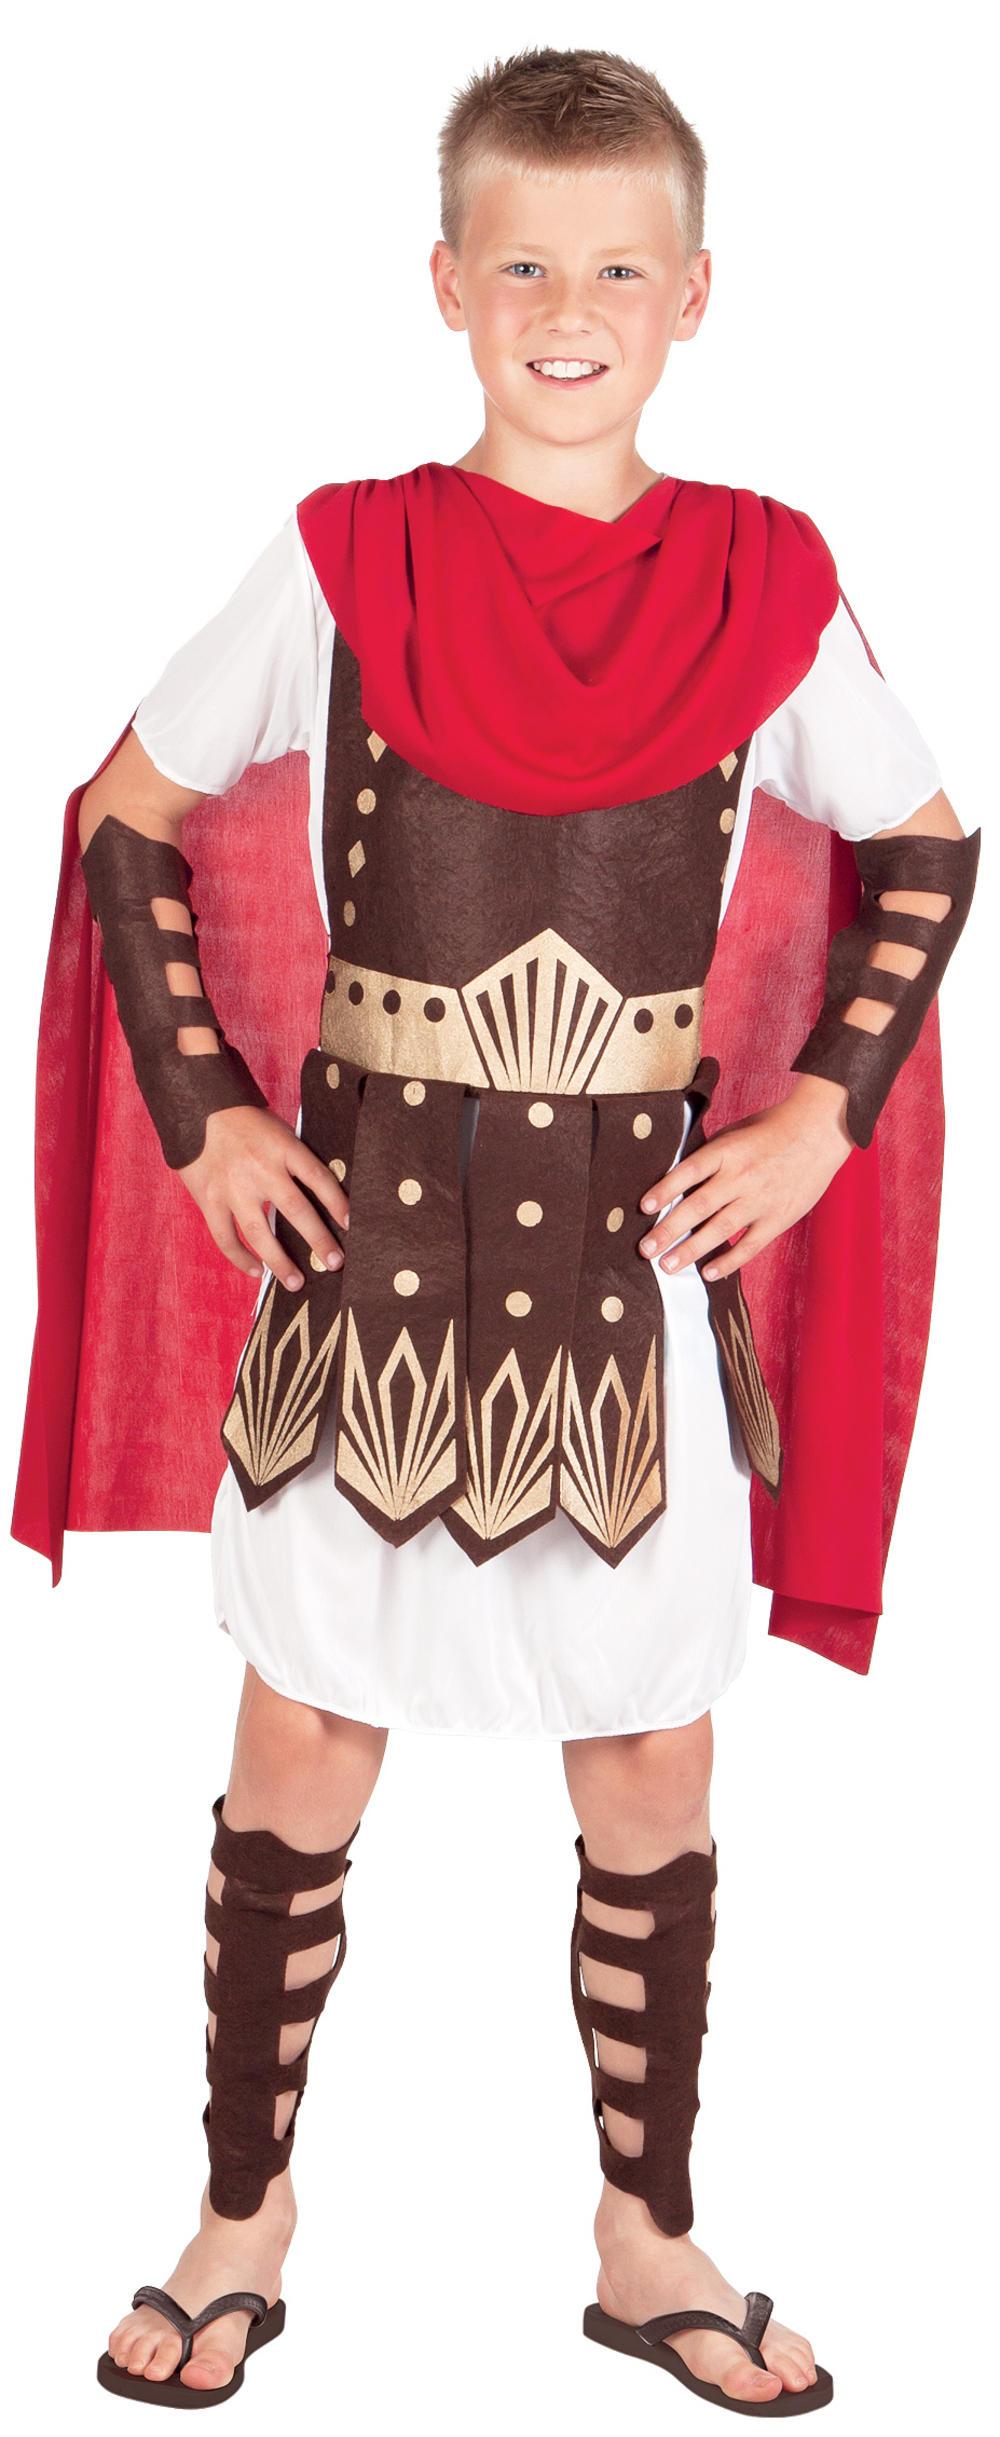 Gladiator Costume